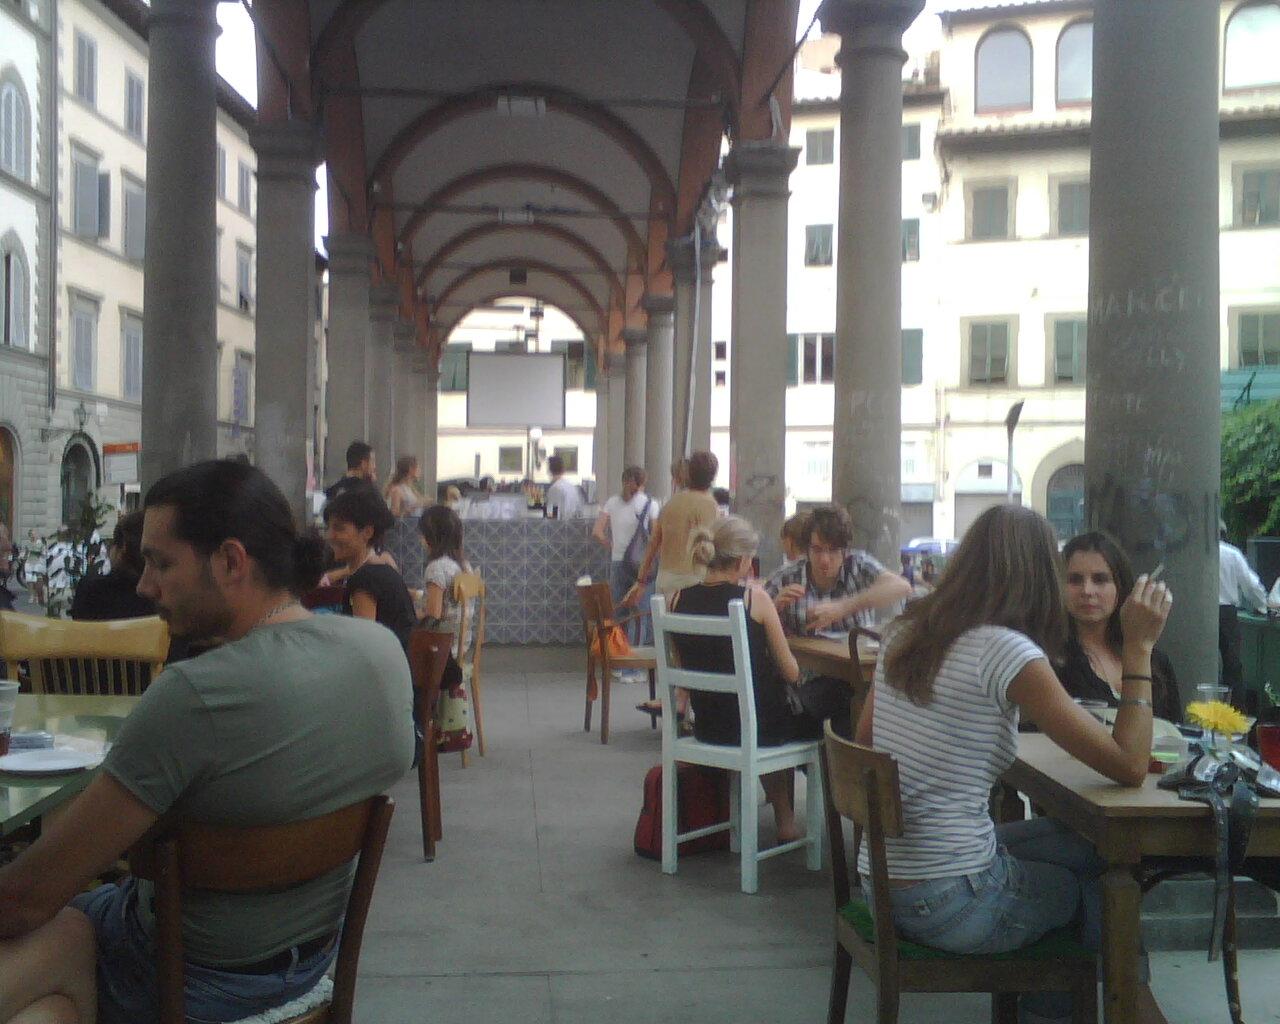 Loggia del Pesce become an open bar in springtime